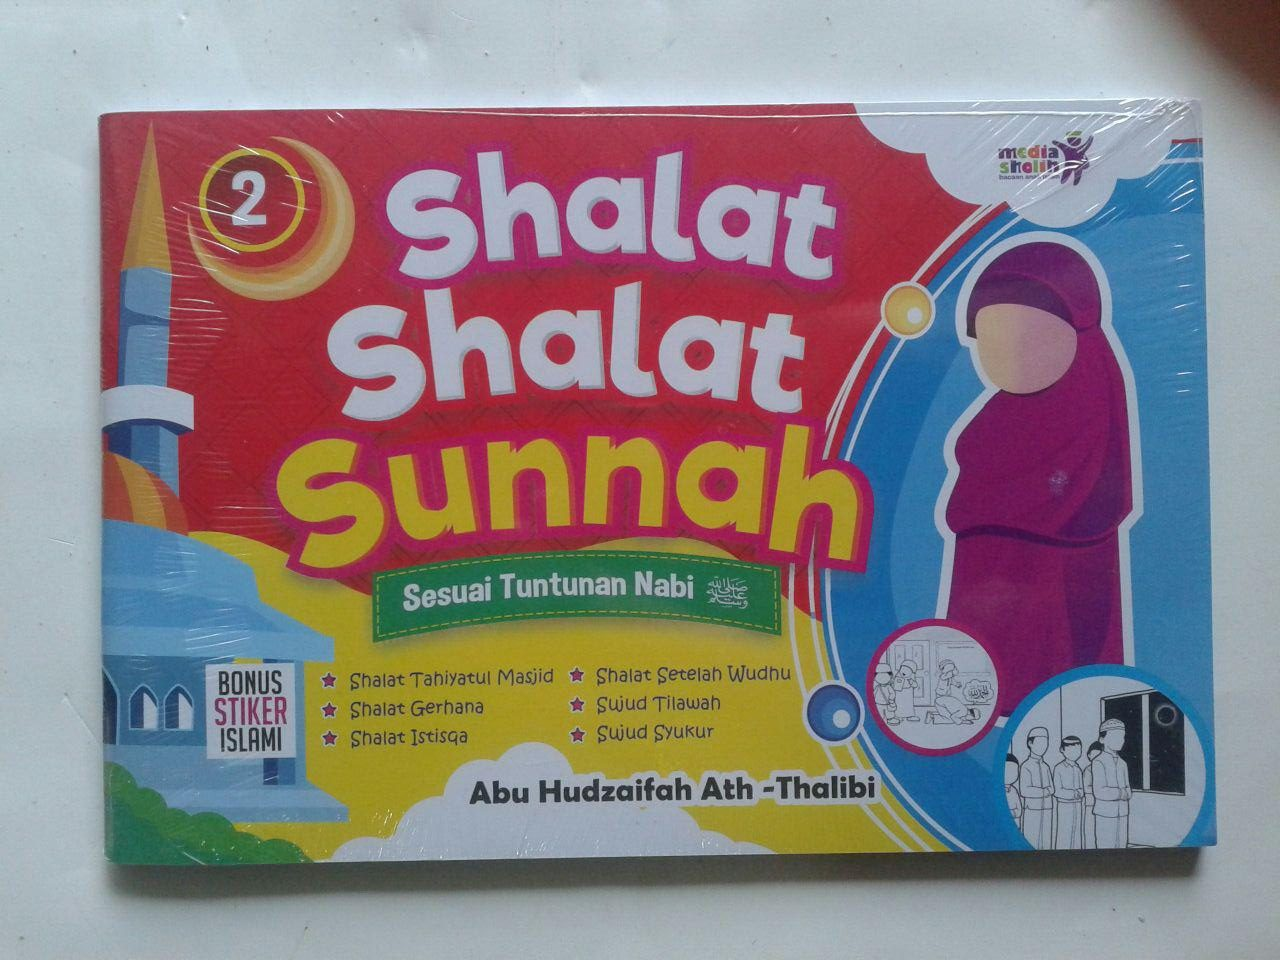 Buku Anak Shalat Shalat Sunnah Sesuai Tuntunan Nabi 2 cover 2